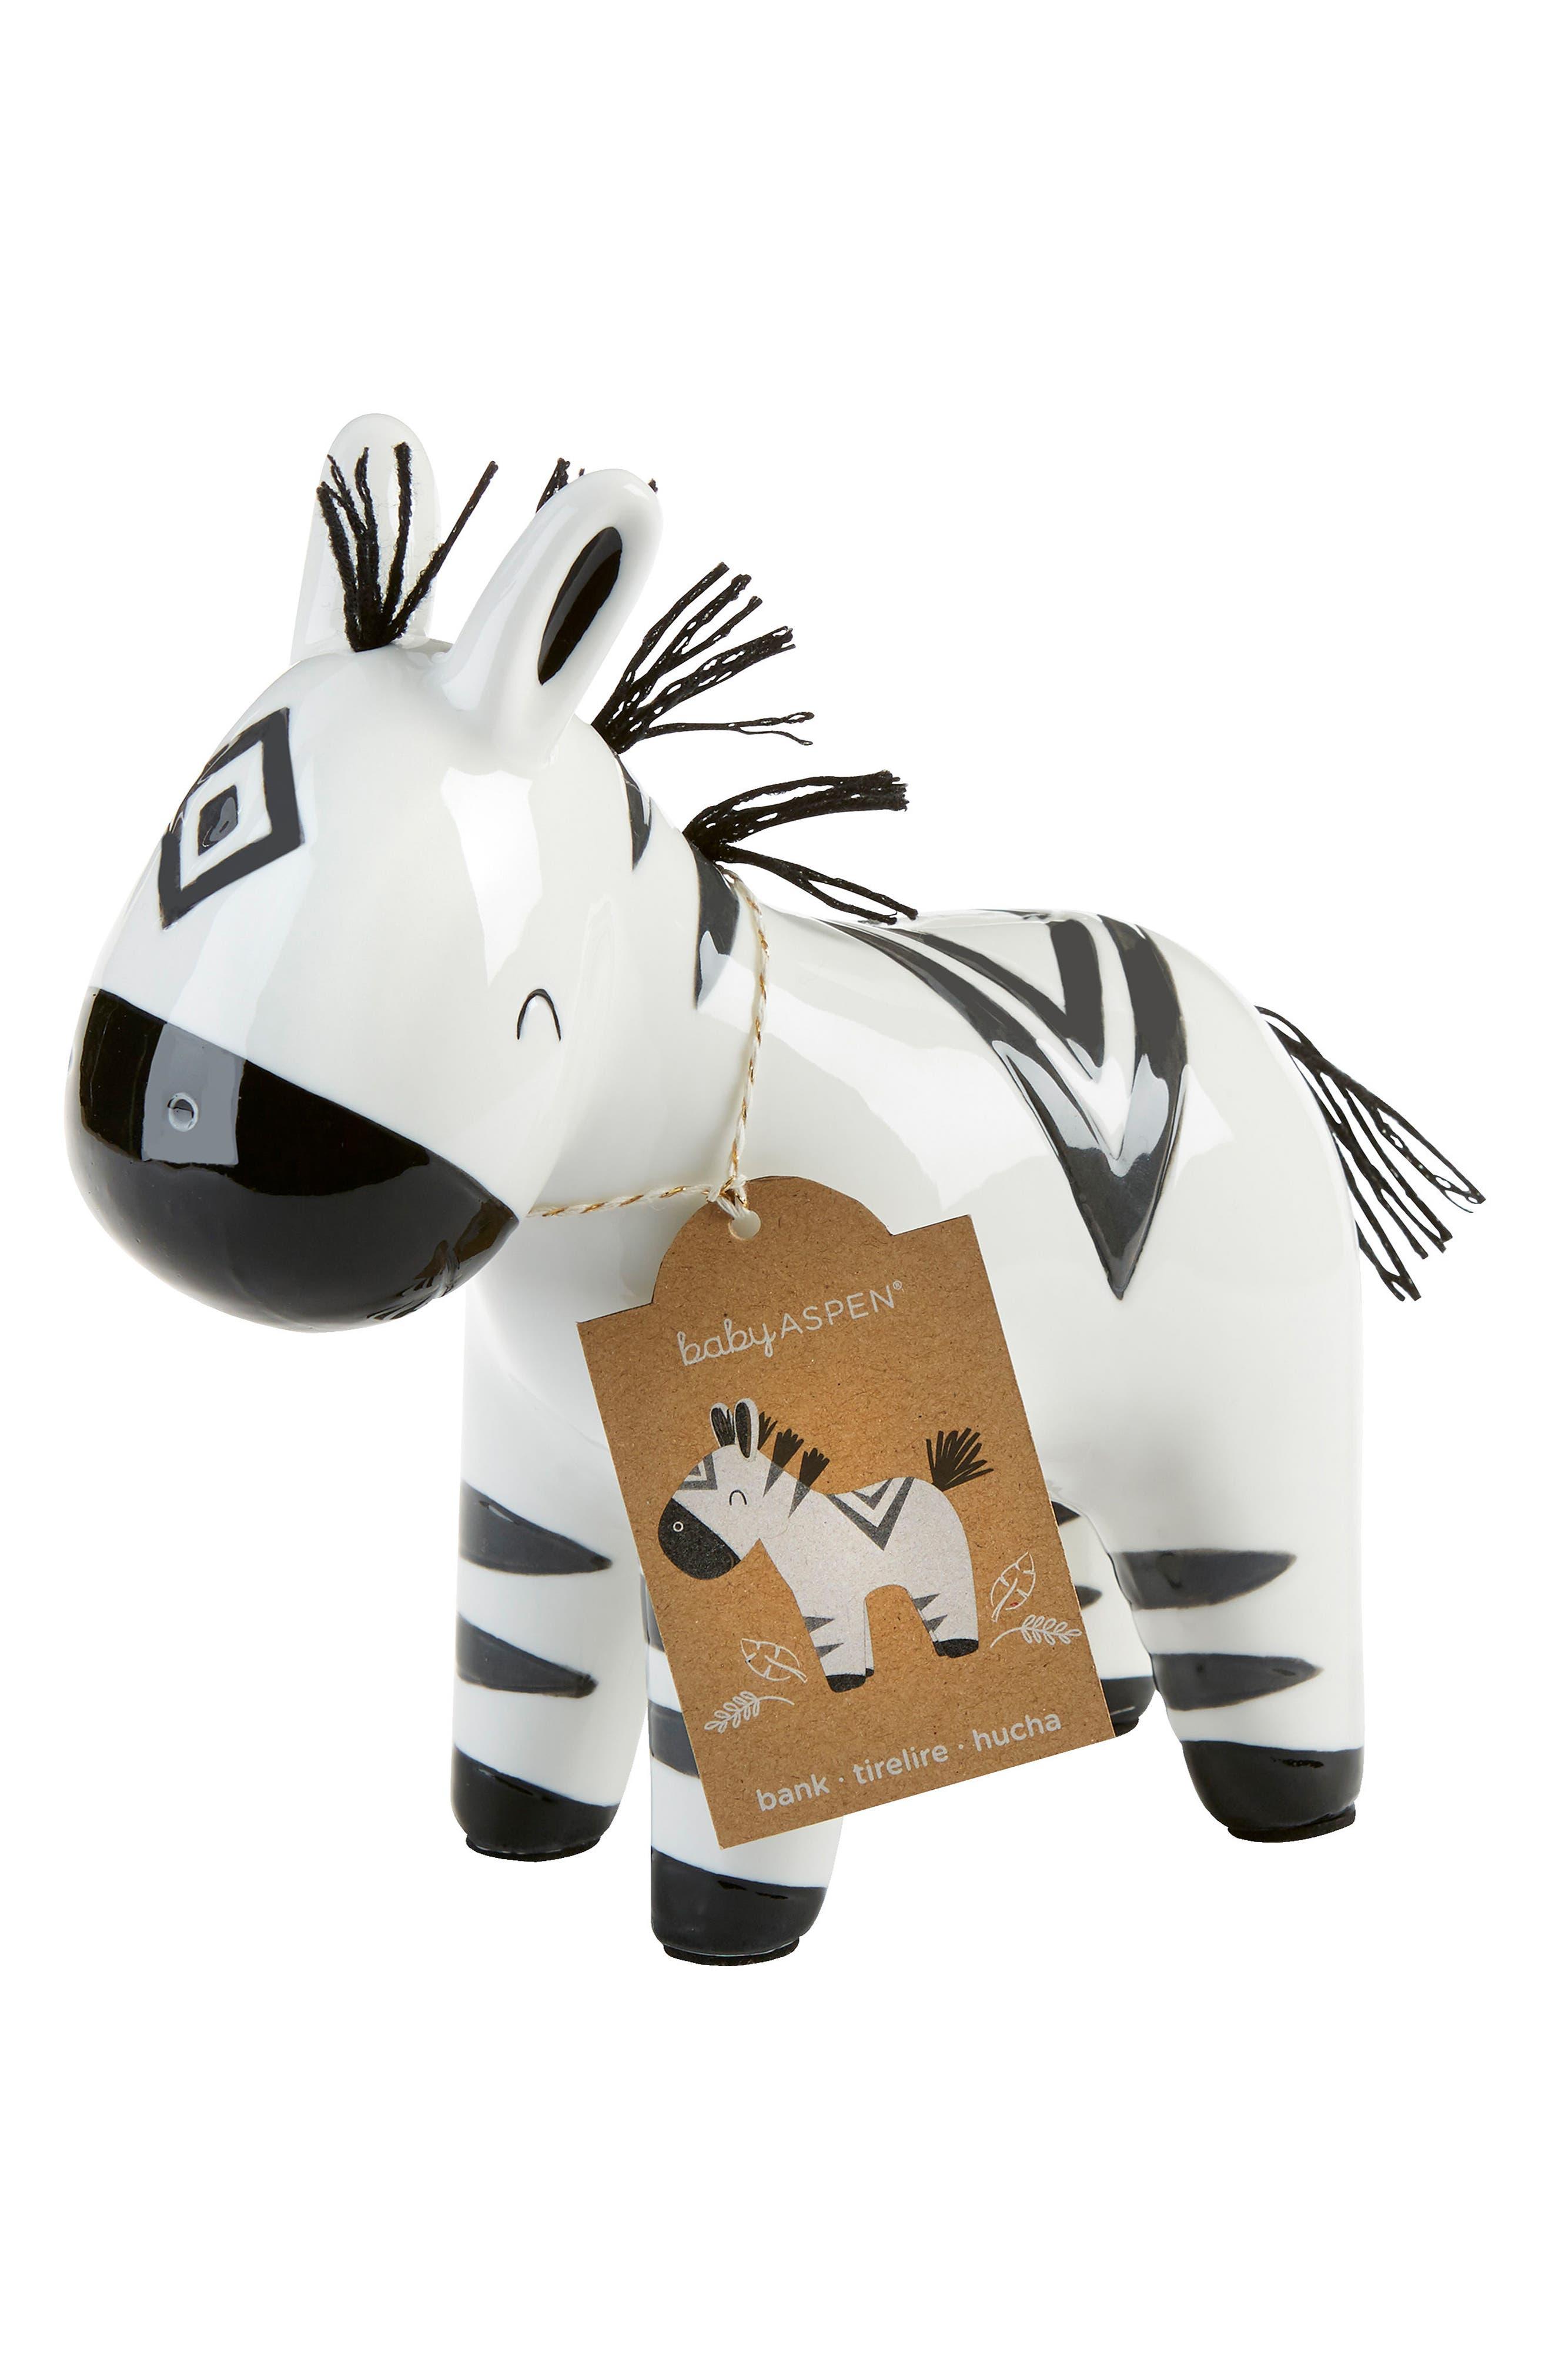 Zebra Ceramic Bank,                             Main thumbnail 1, color,                             WHITE/ BLACK